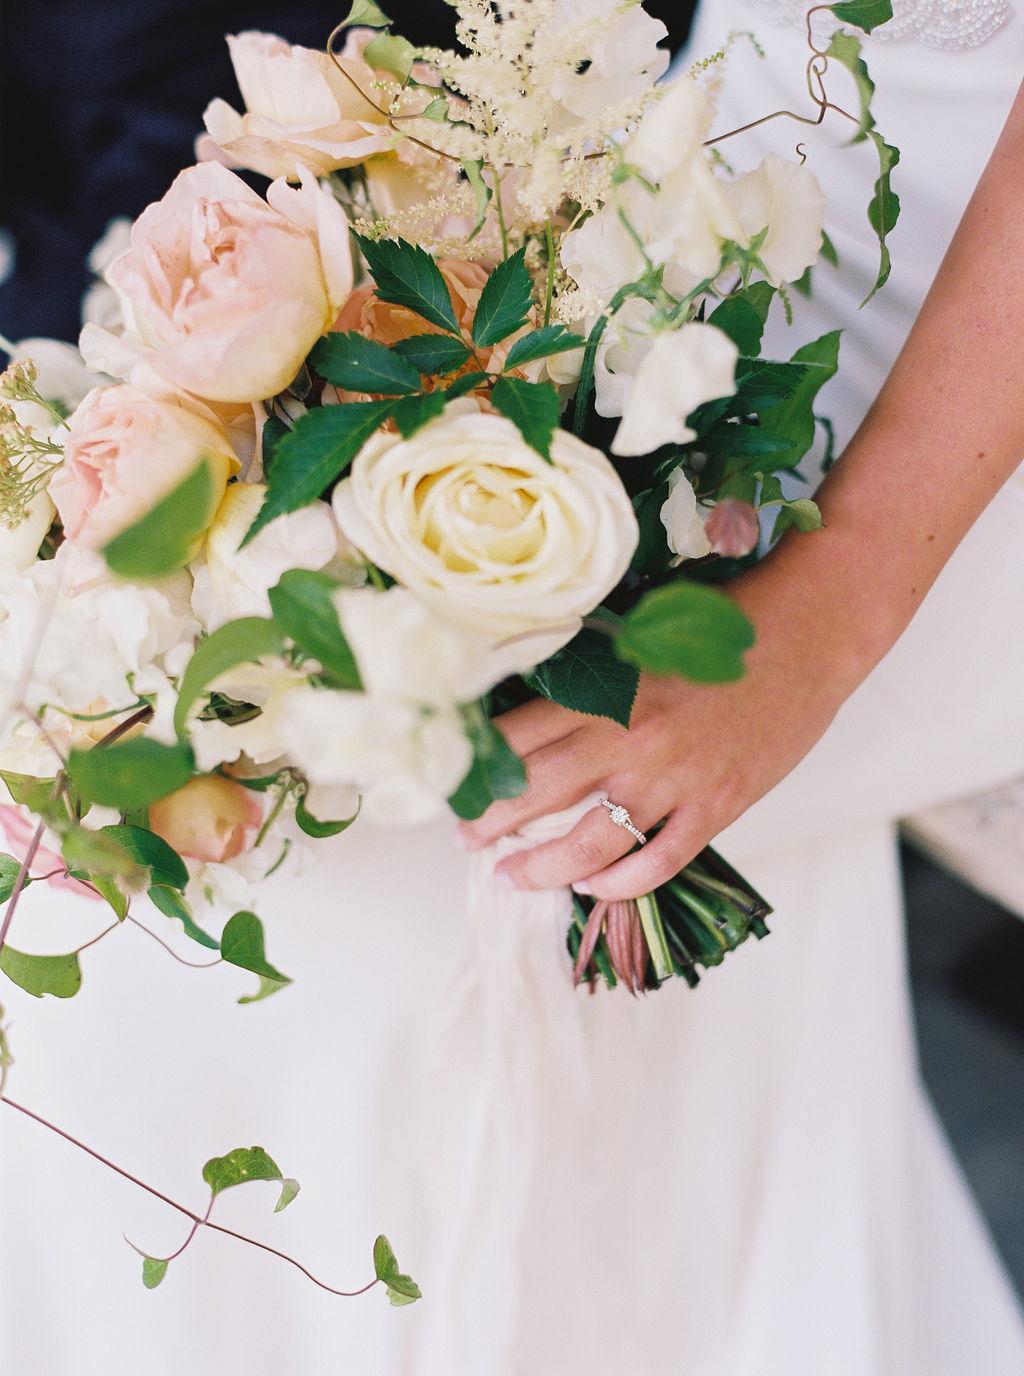 Alexandra-Elise-Photography-Film-Wedding-Photographer-Sonnenberg-Gardens-Finger-Lakes-Canandaigua-Bride-Groom-102.jpg